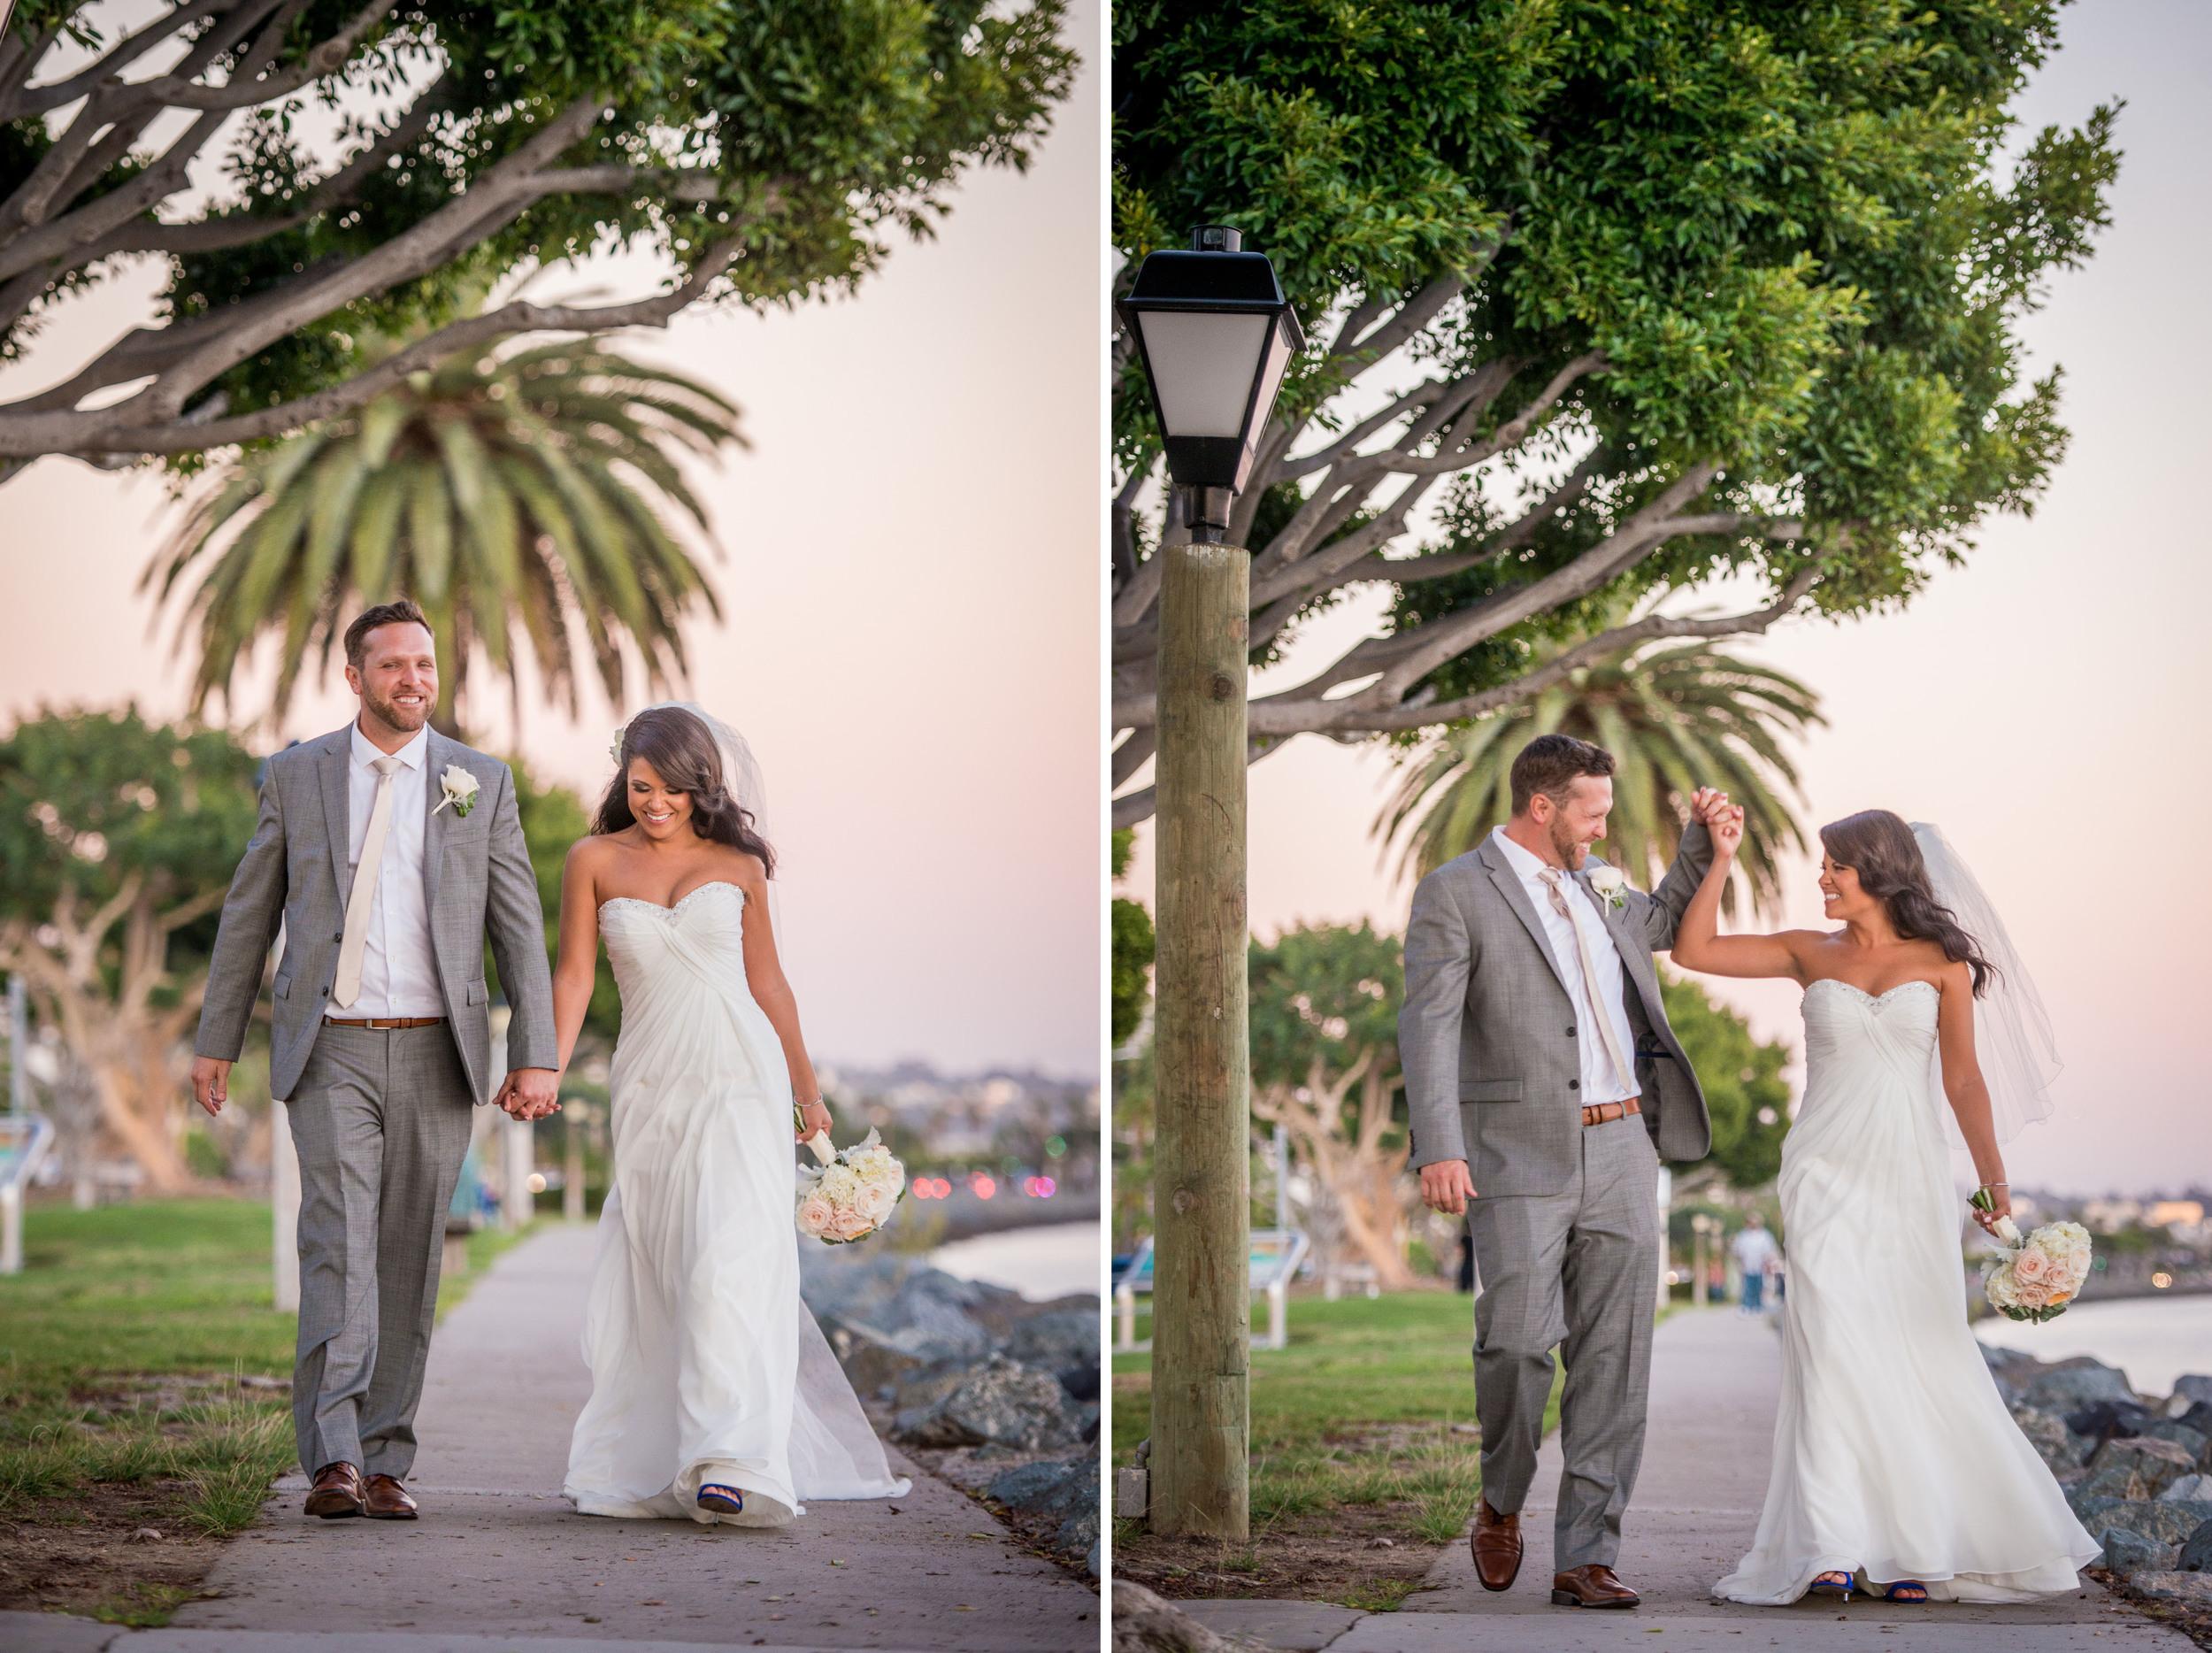 tom-hams-lighthouse-wedding-_D803162.jpg